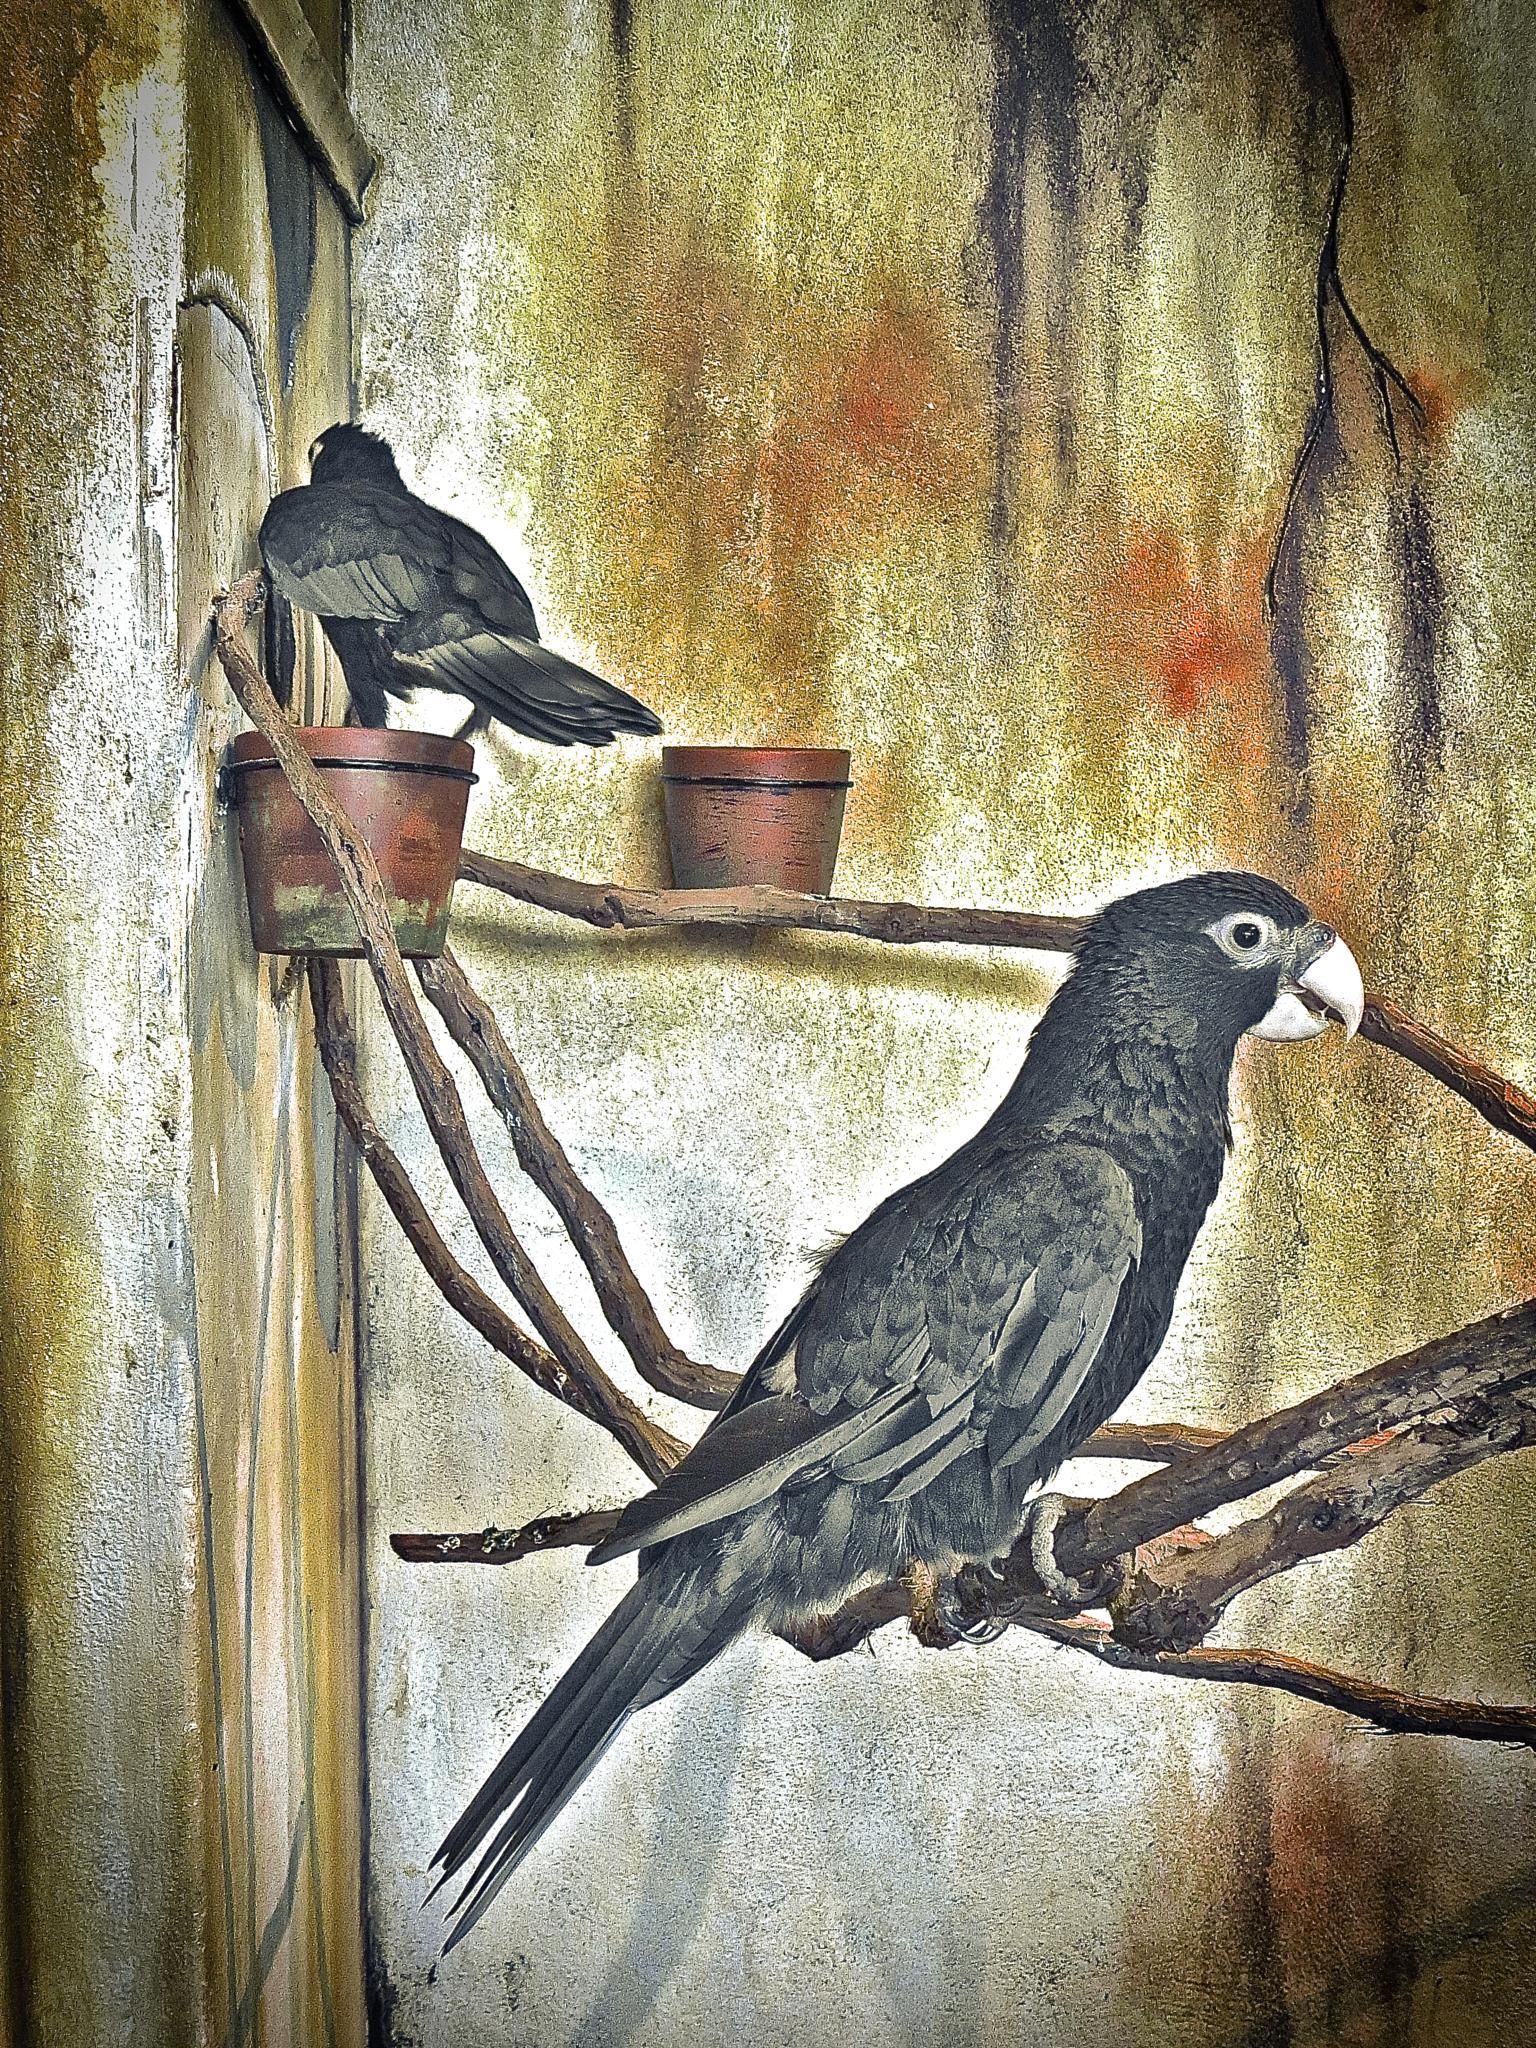 Birds by Tom Ratigan